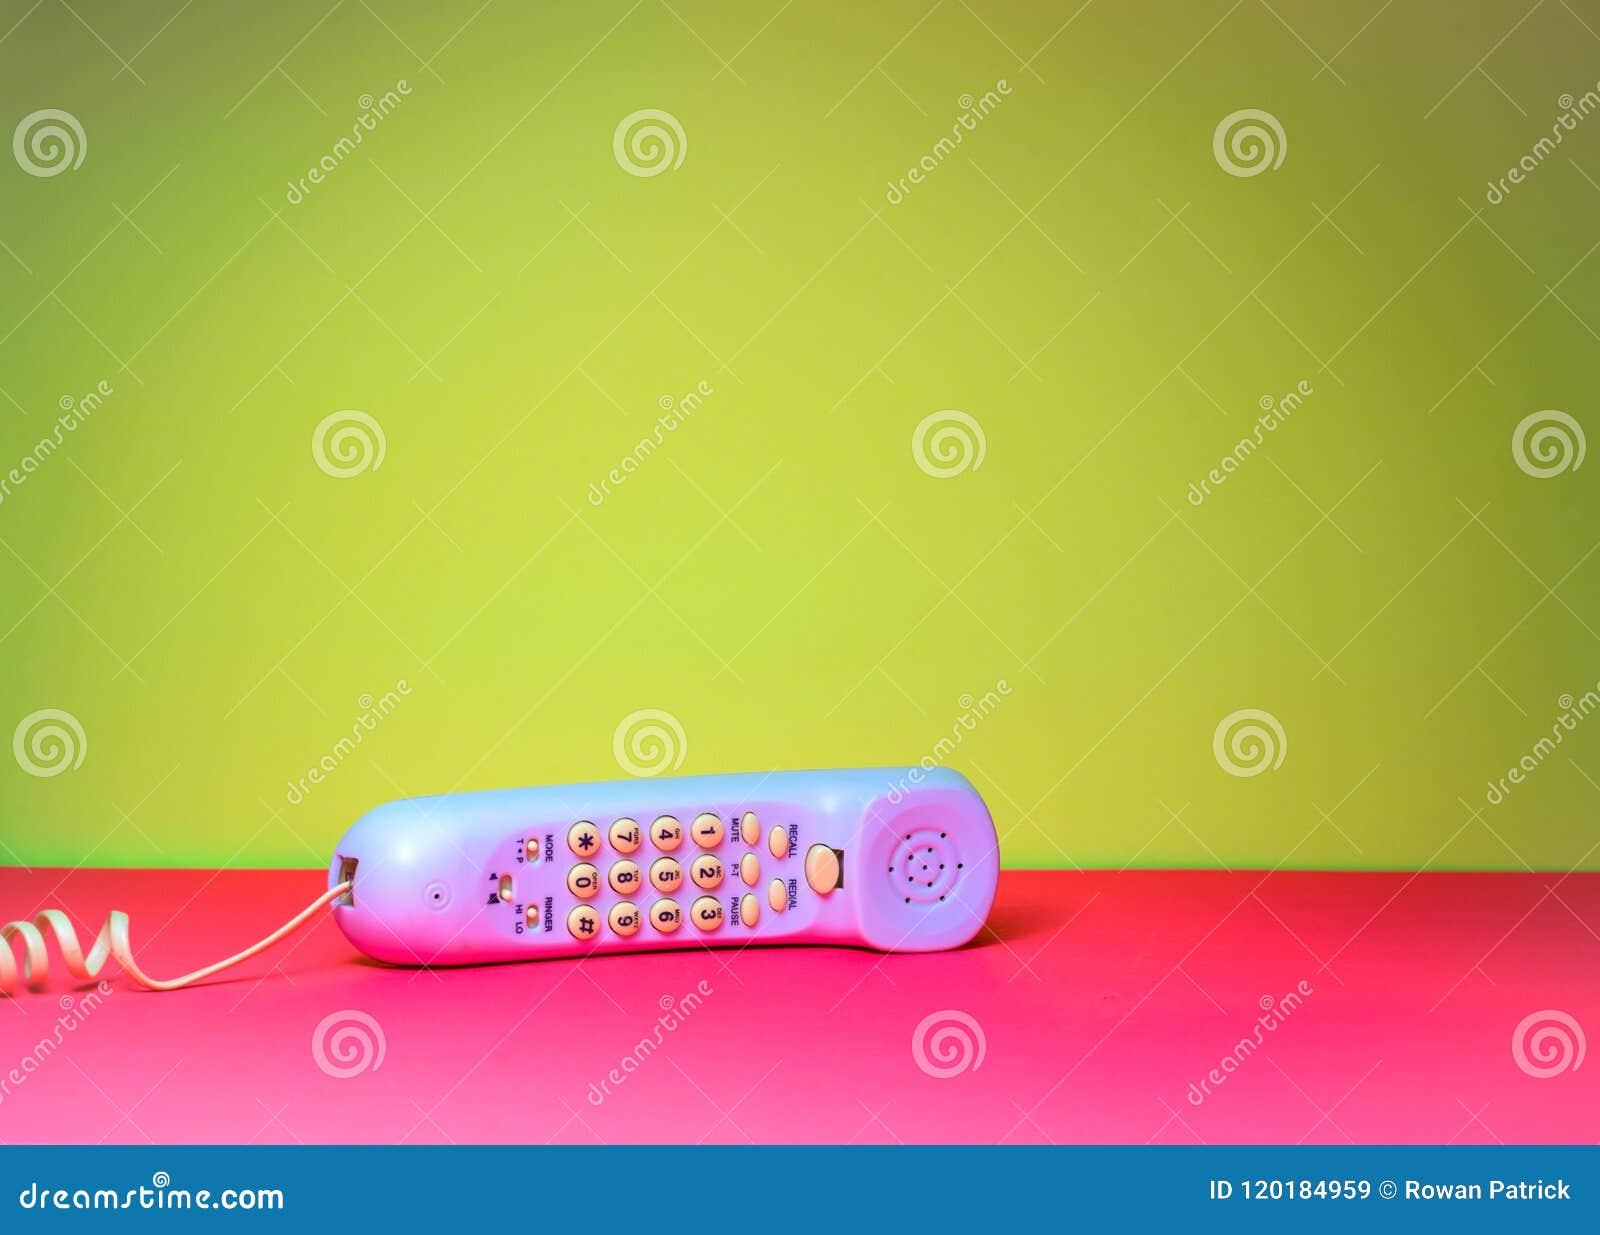 Corded telephone handset